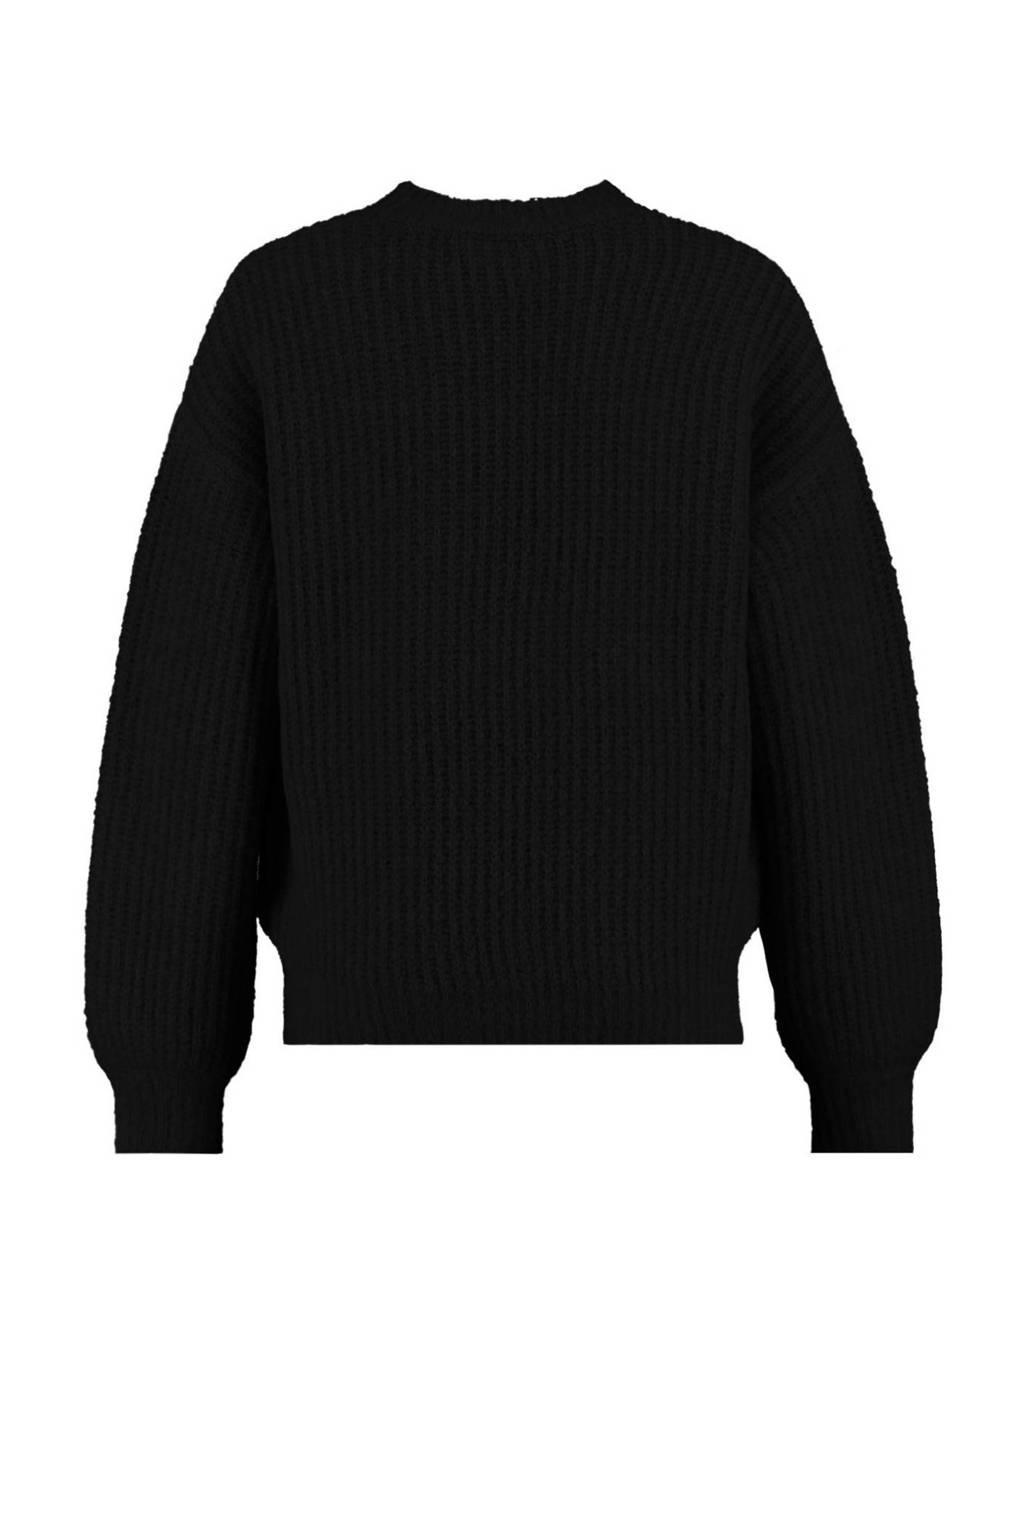 CoolCat Junior trui Kensi zwart, Zwart